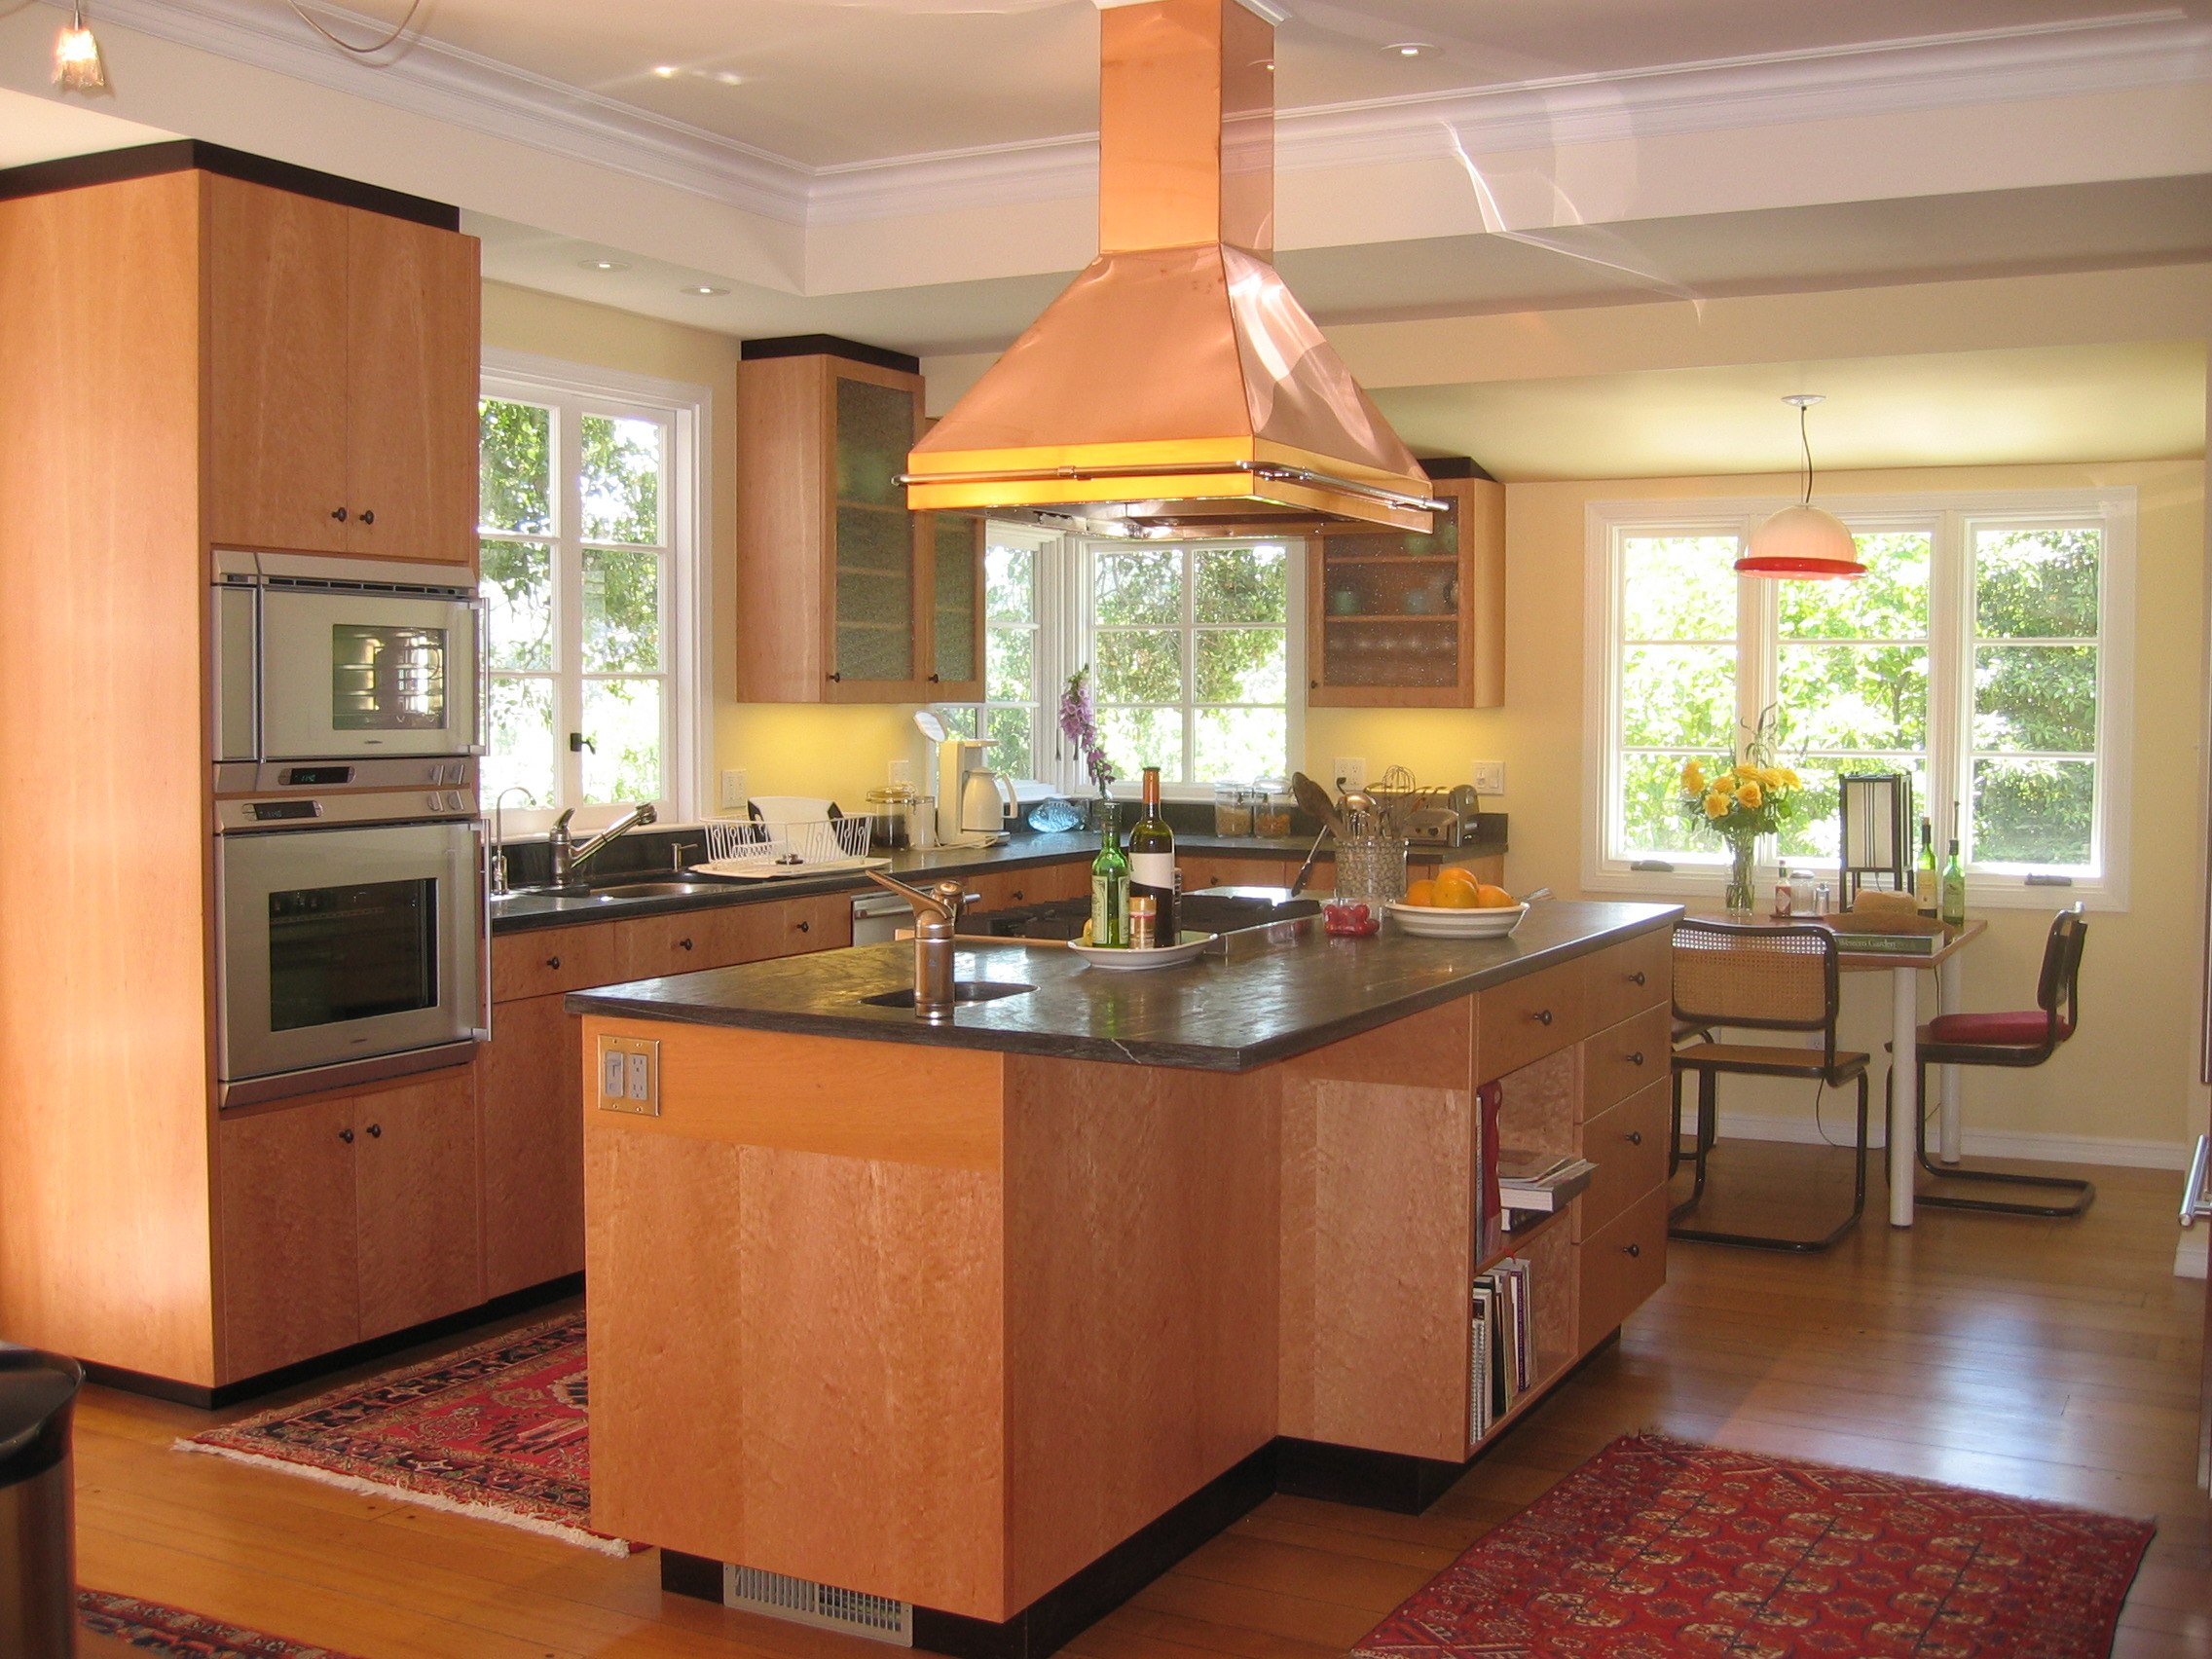 axelrod kitchen.JPG